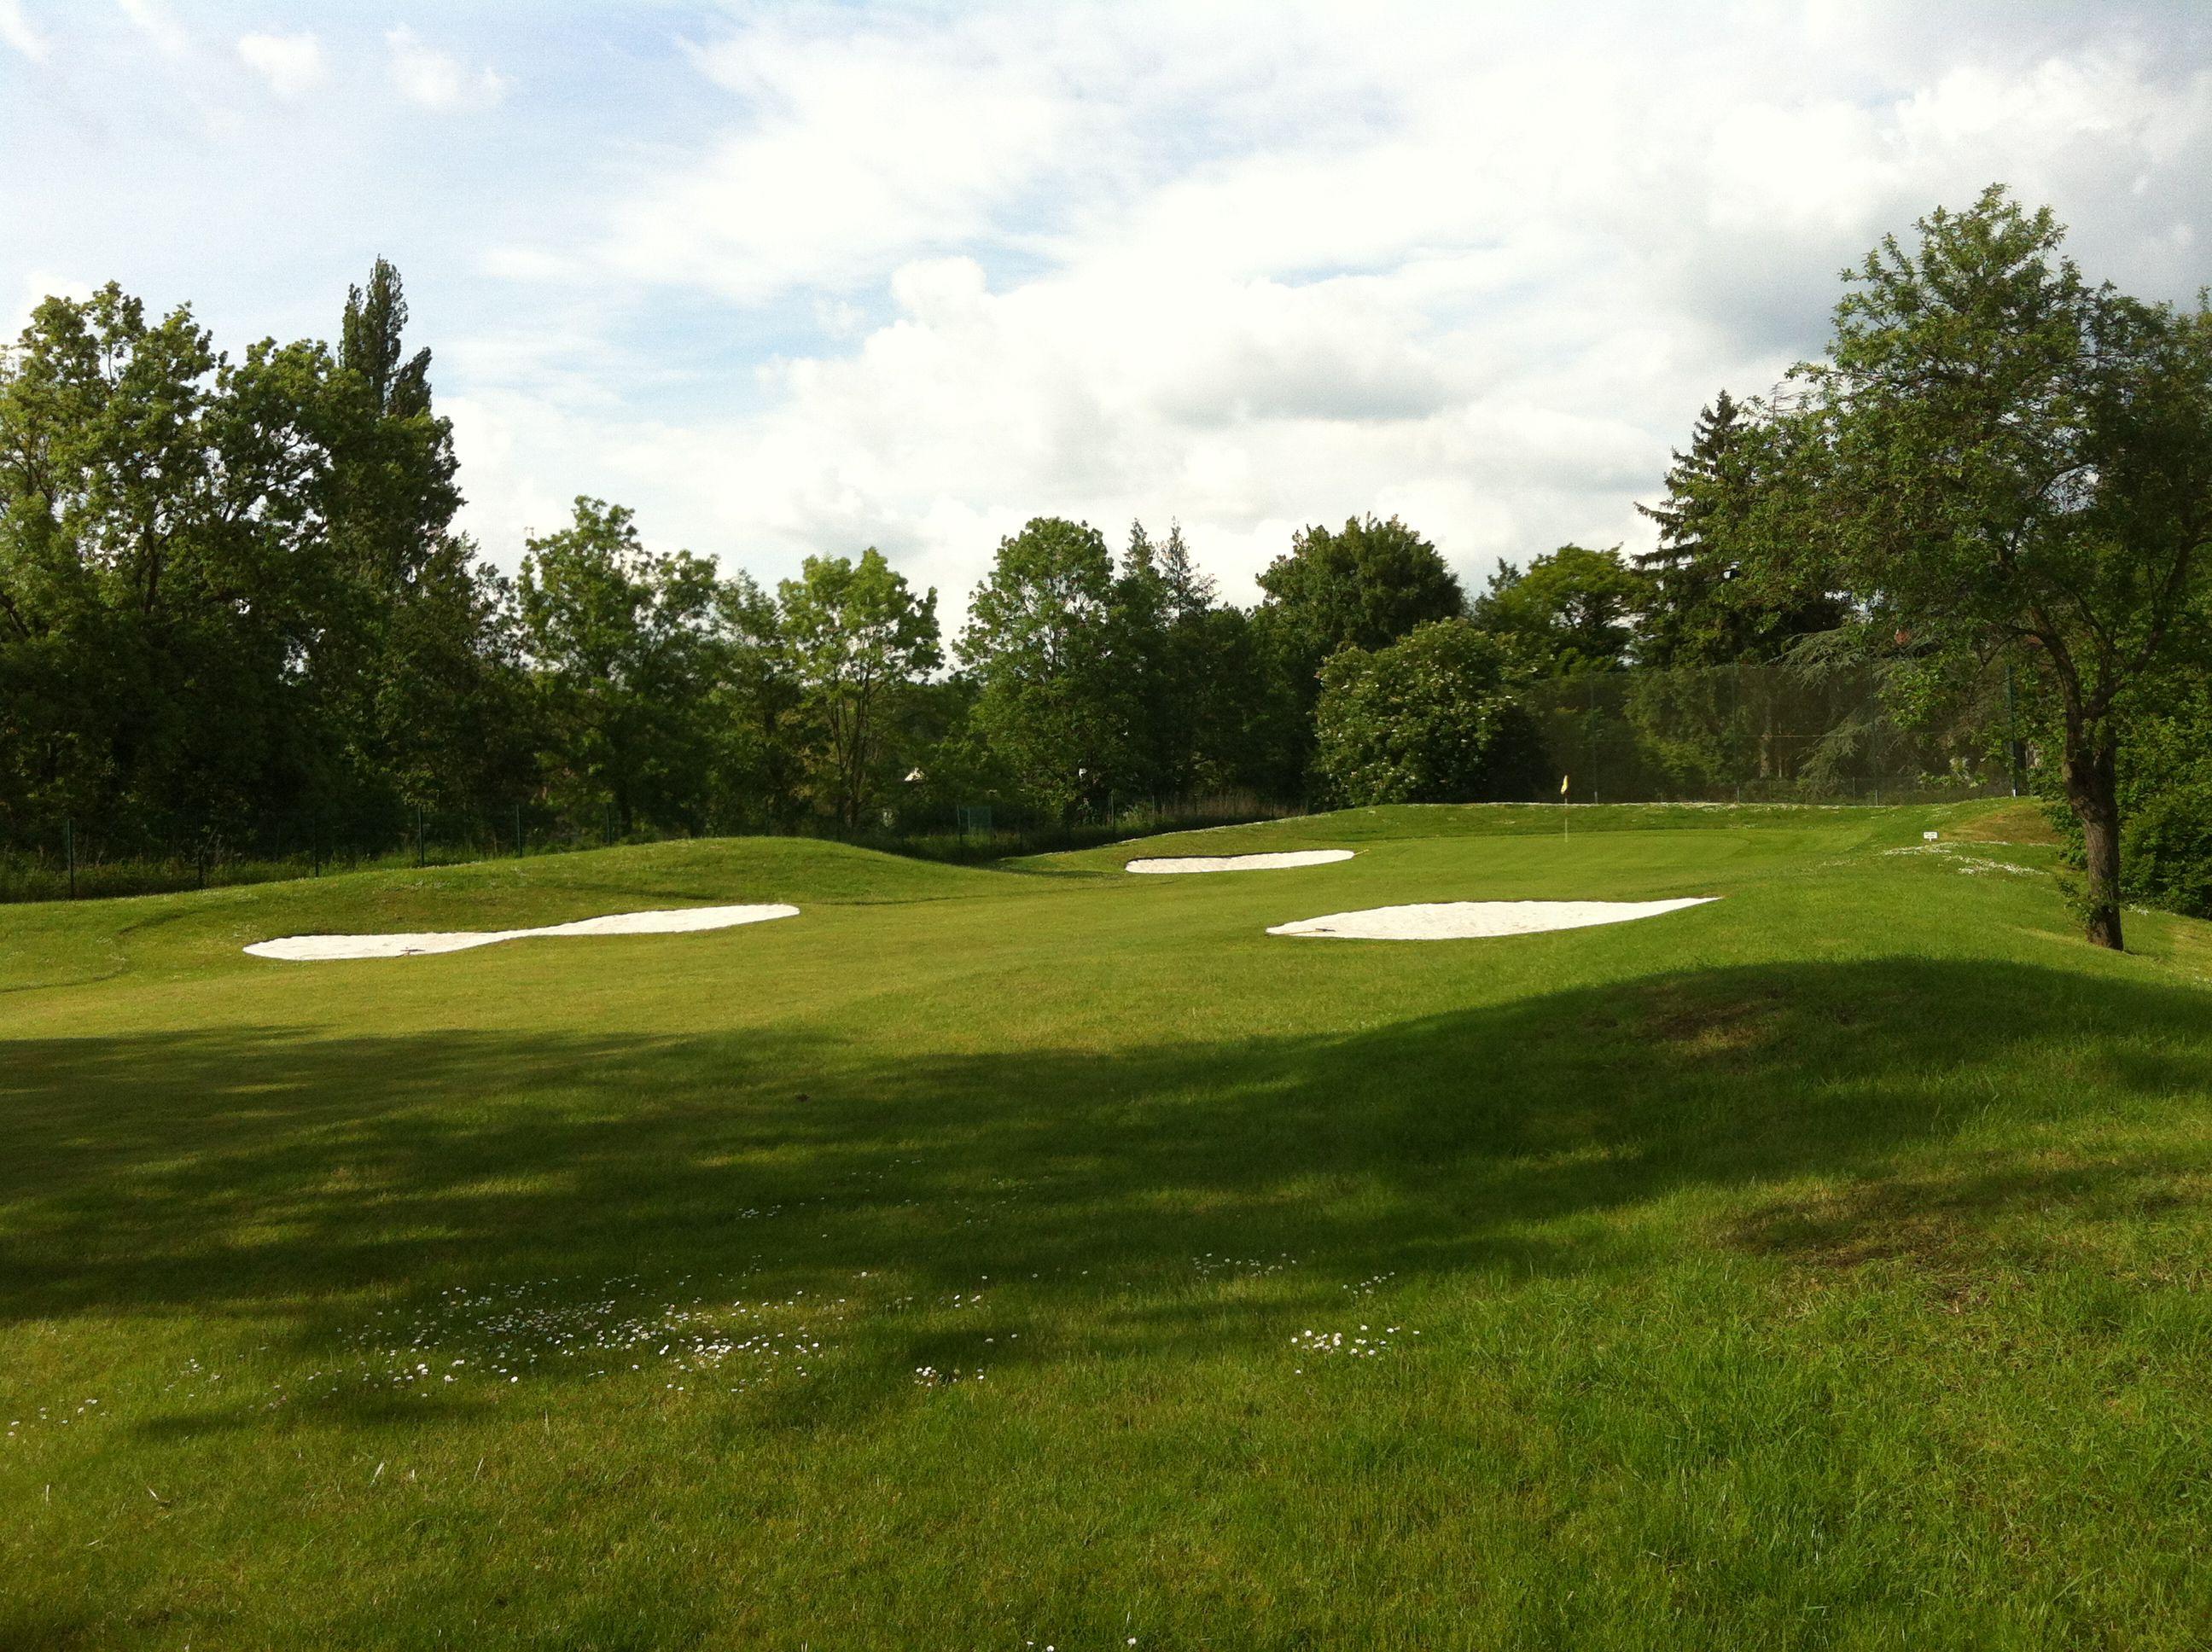 saint ouen l 39 aumone golf club all square golf. Black Bedroom Furniture Sets. Home Design Ideas